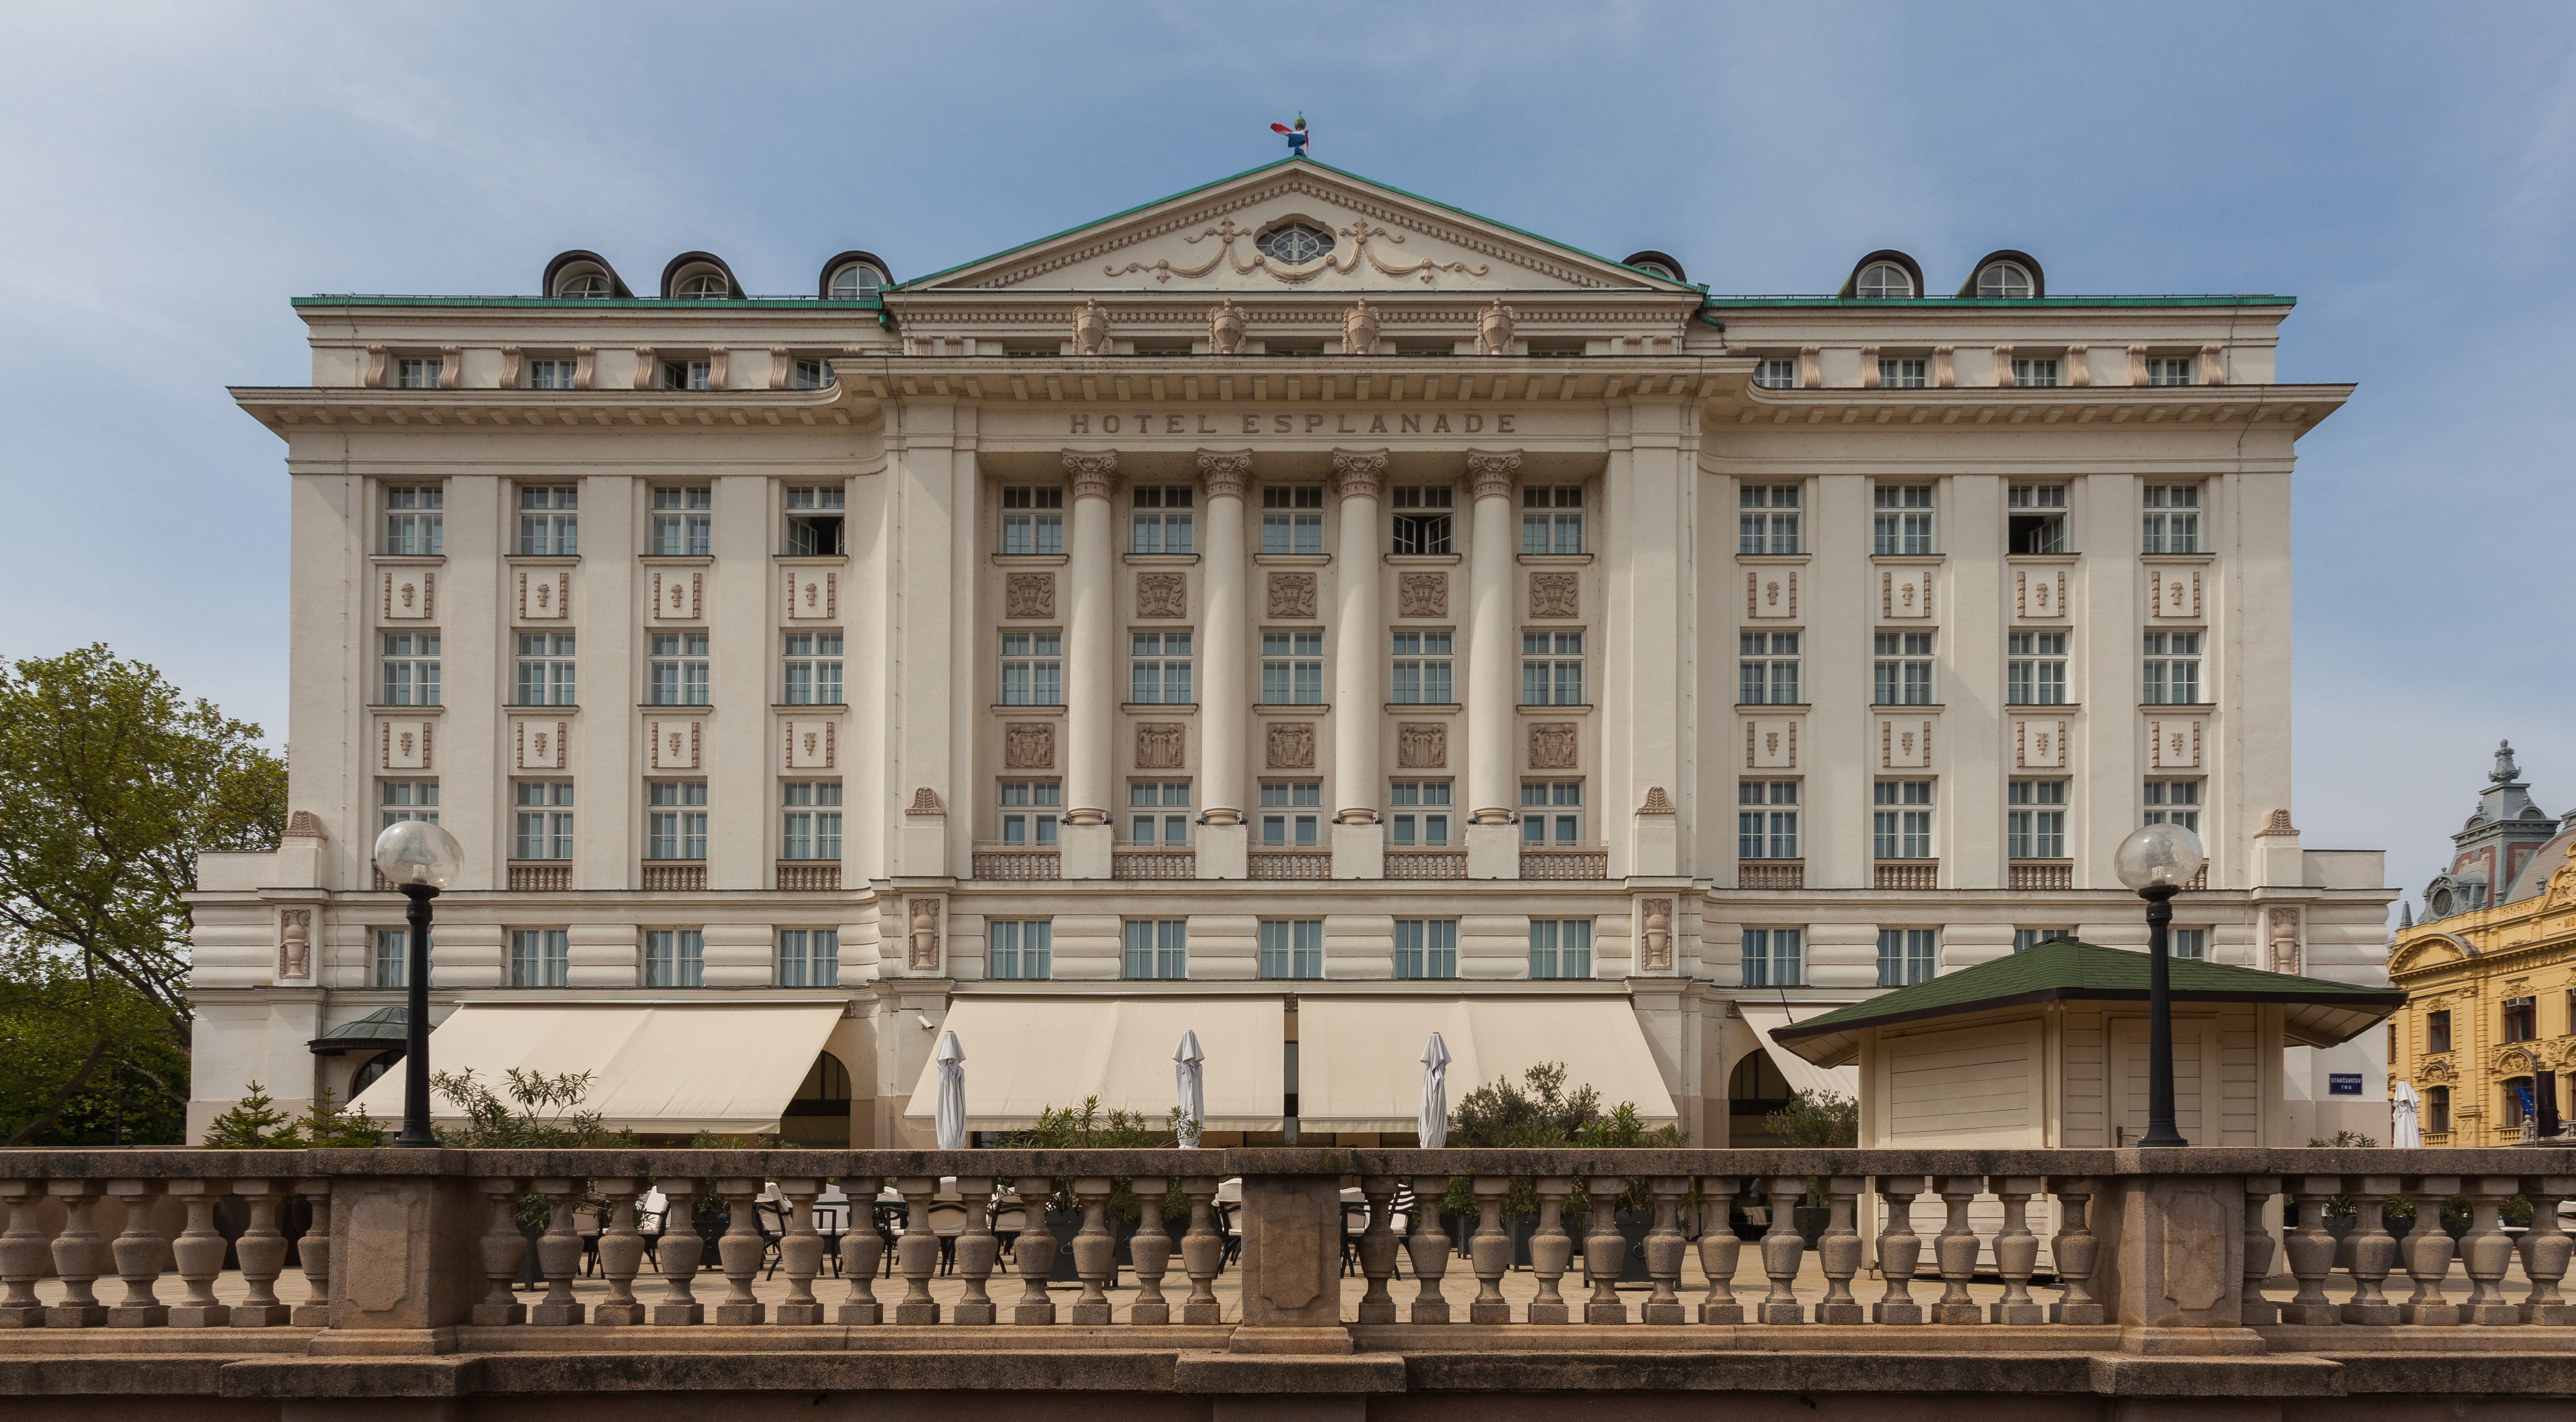 File hotel esplanade zagreb croacia 2014 04 13 dd 01 for Hotels zagreb